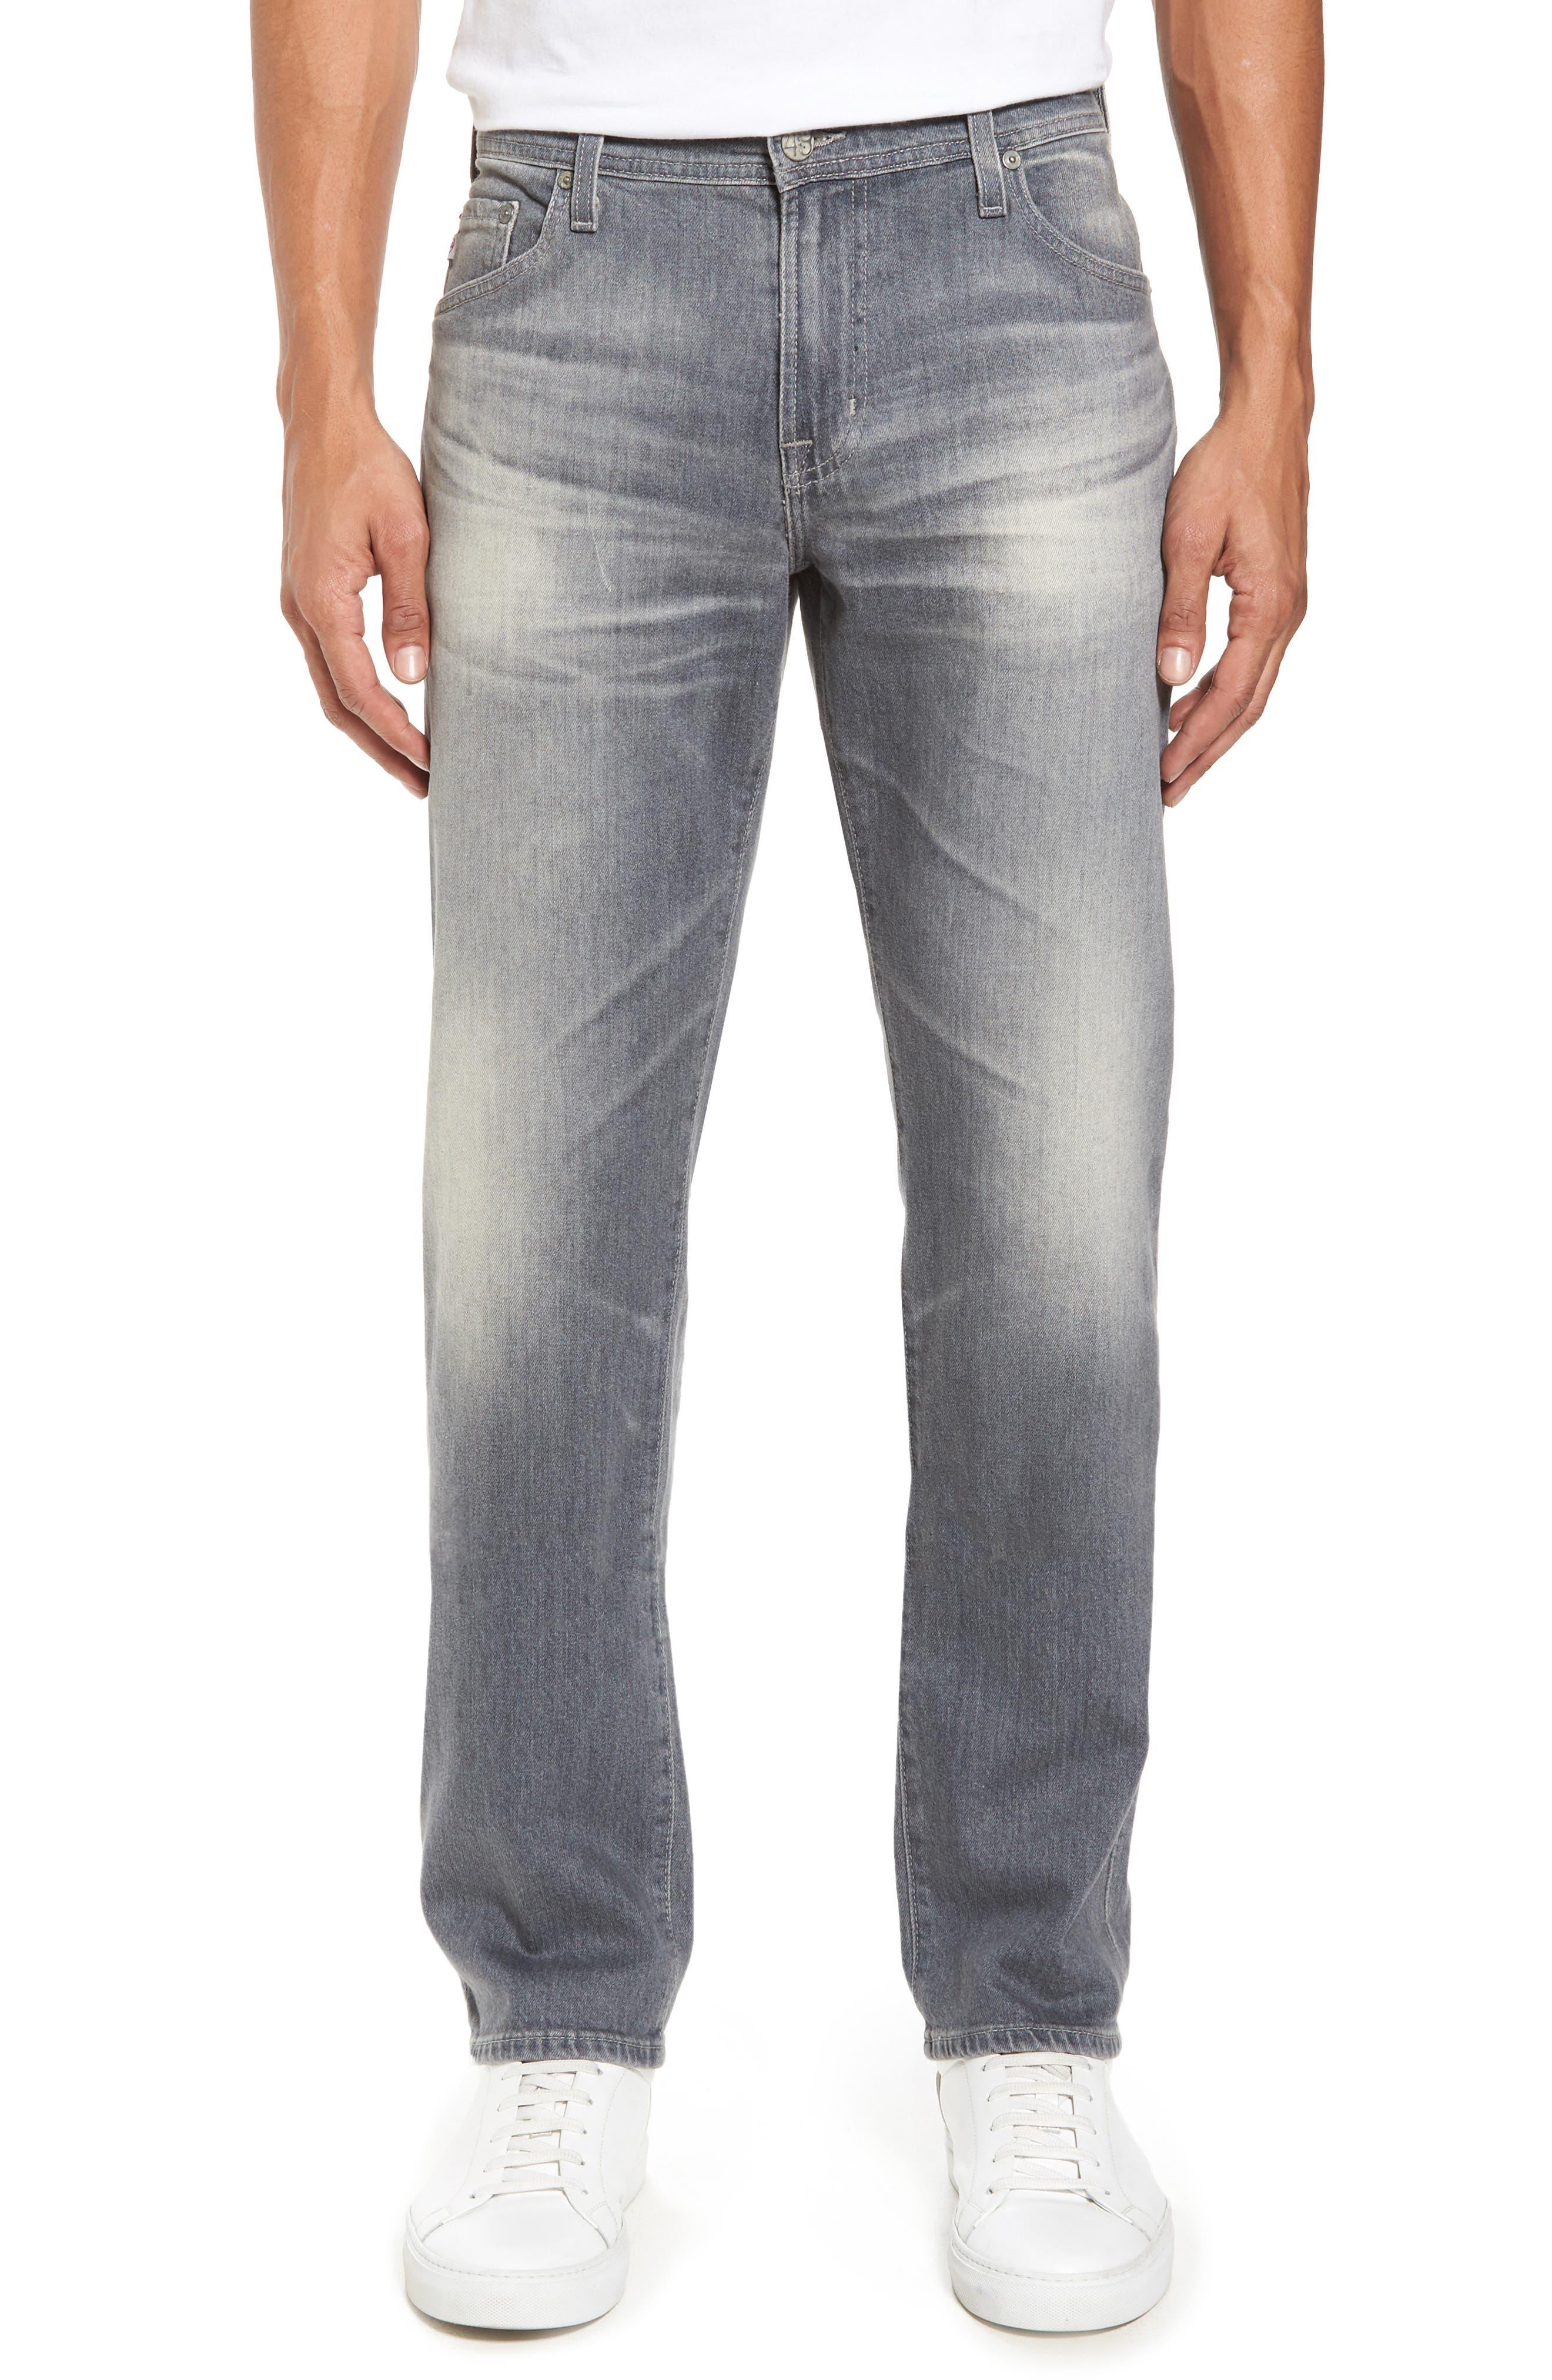 Graduate Slim Straight Fit Jeans,                         Main,                         color, 020